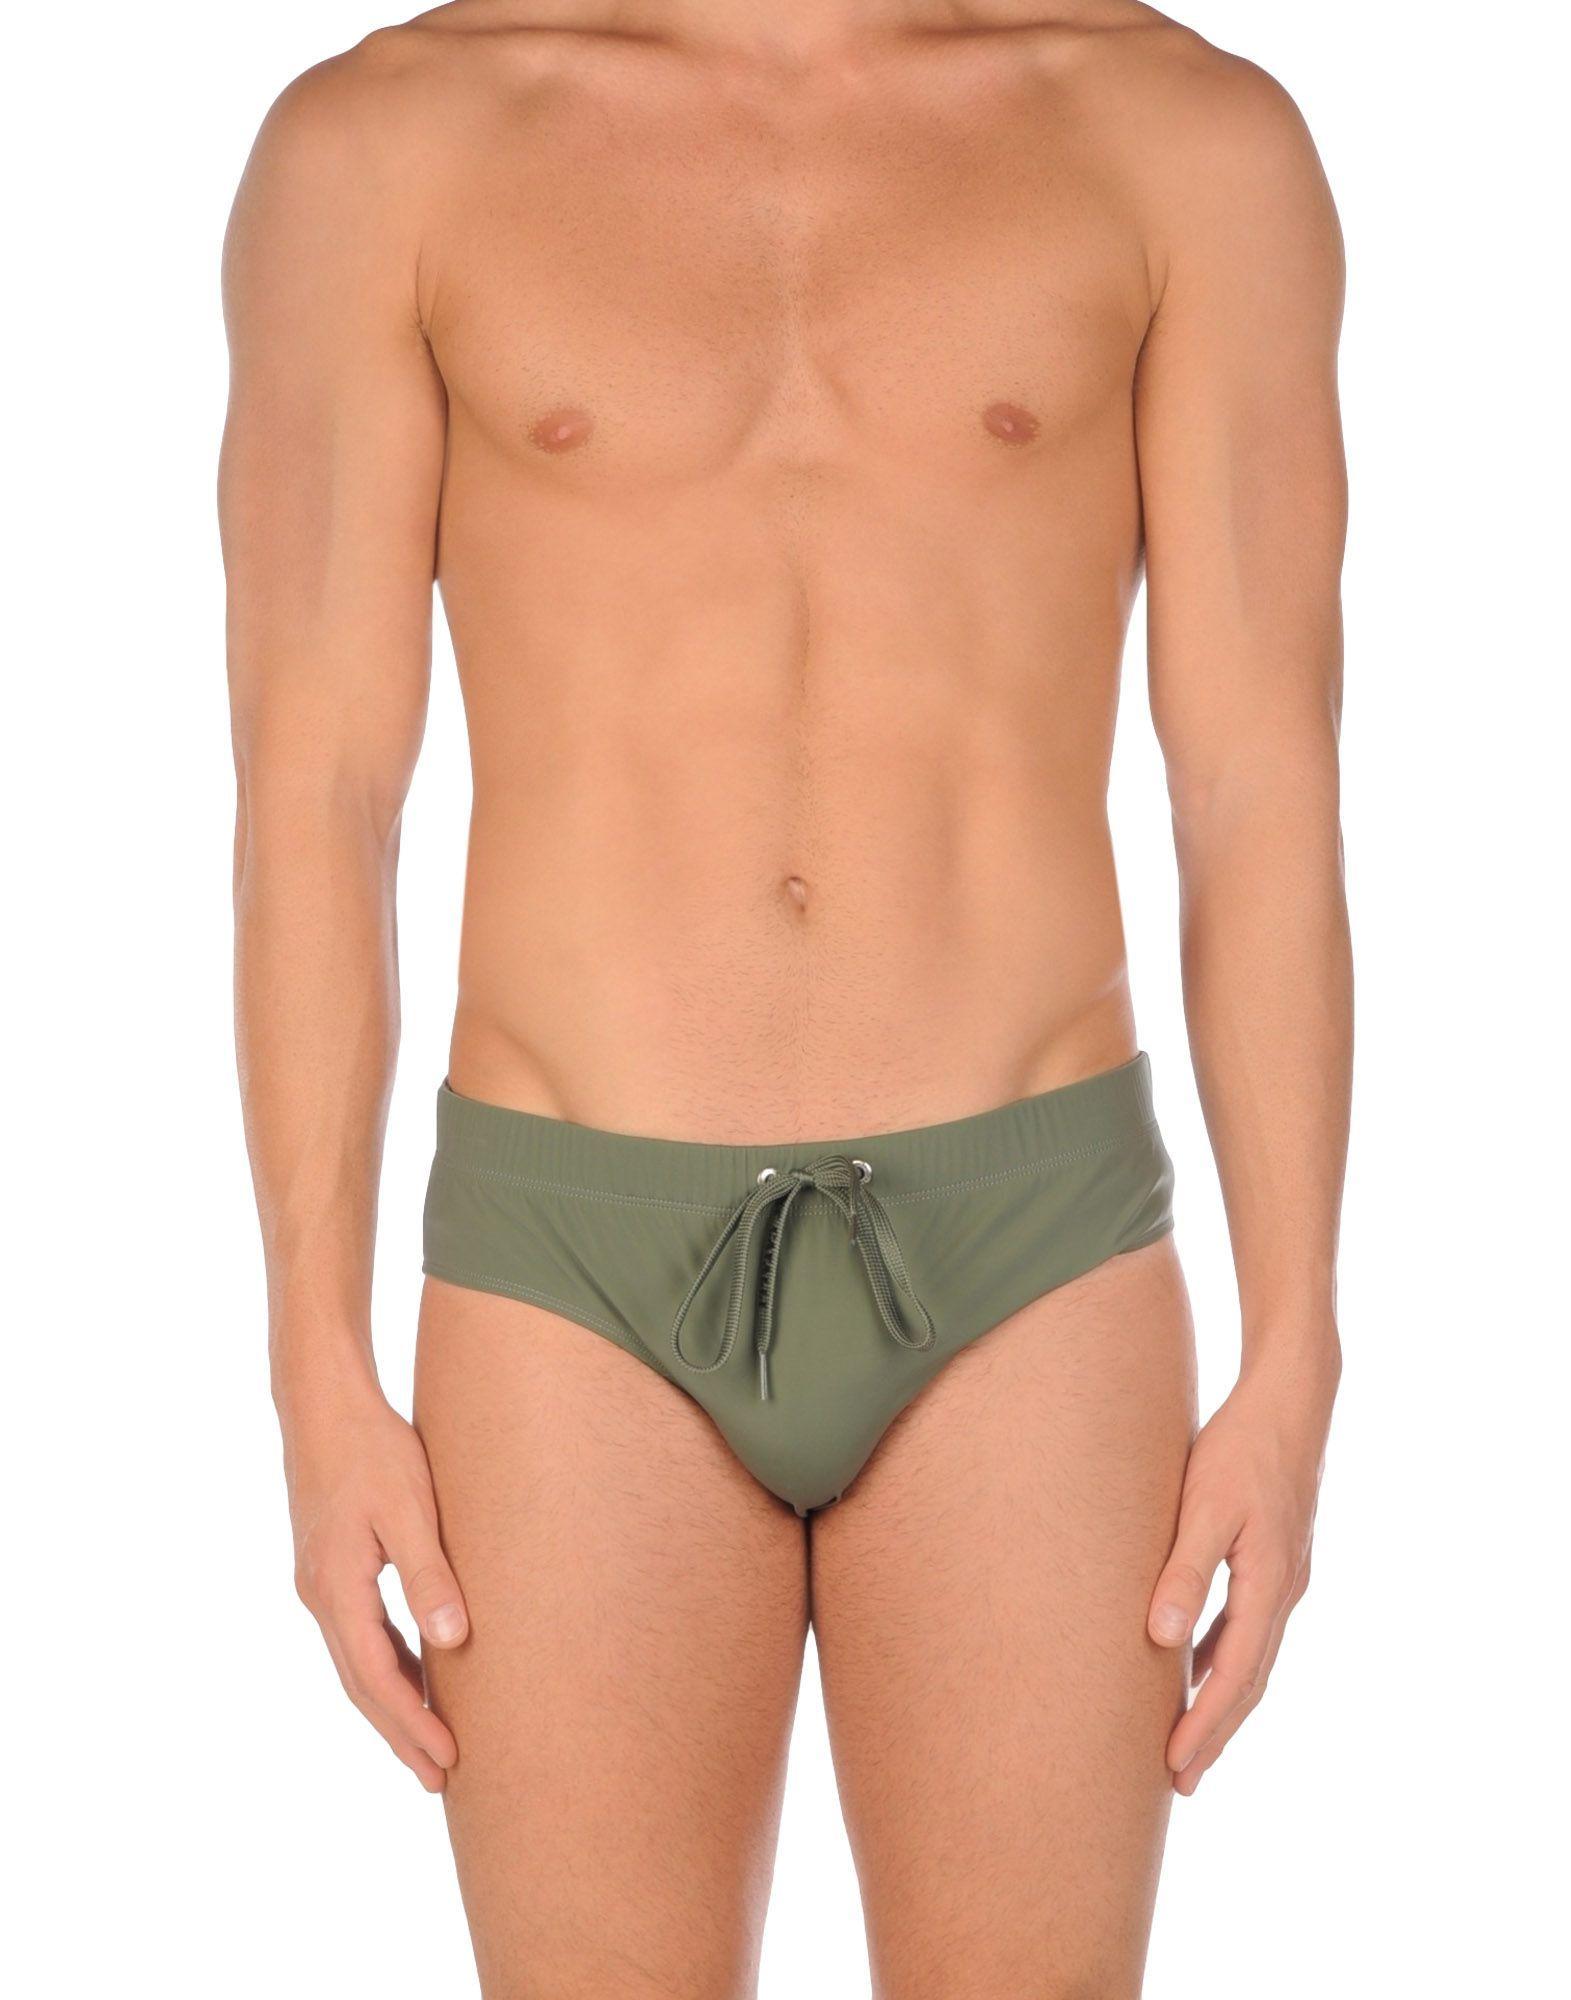 500f808bf4 JUST CAVALLI BEACHWEAR Brief trunks Military green Polyamide Elastane men  Swimwear